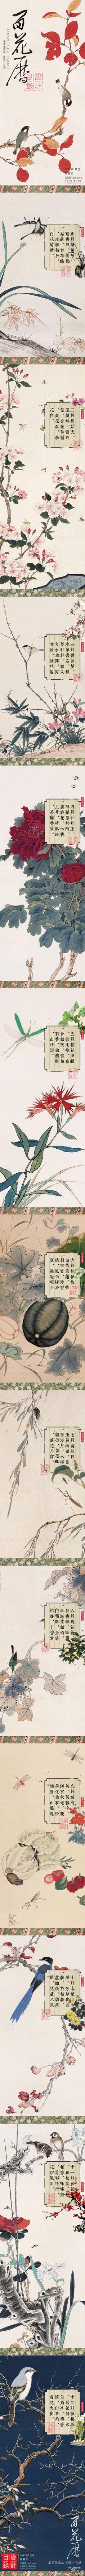 Chinese Flowers Calendar